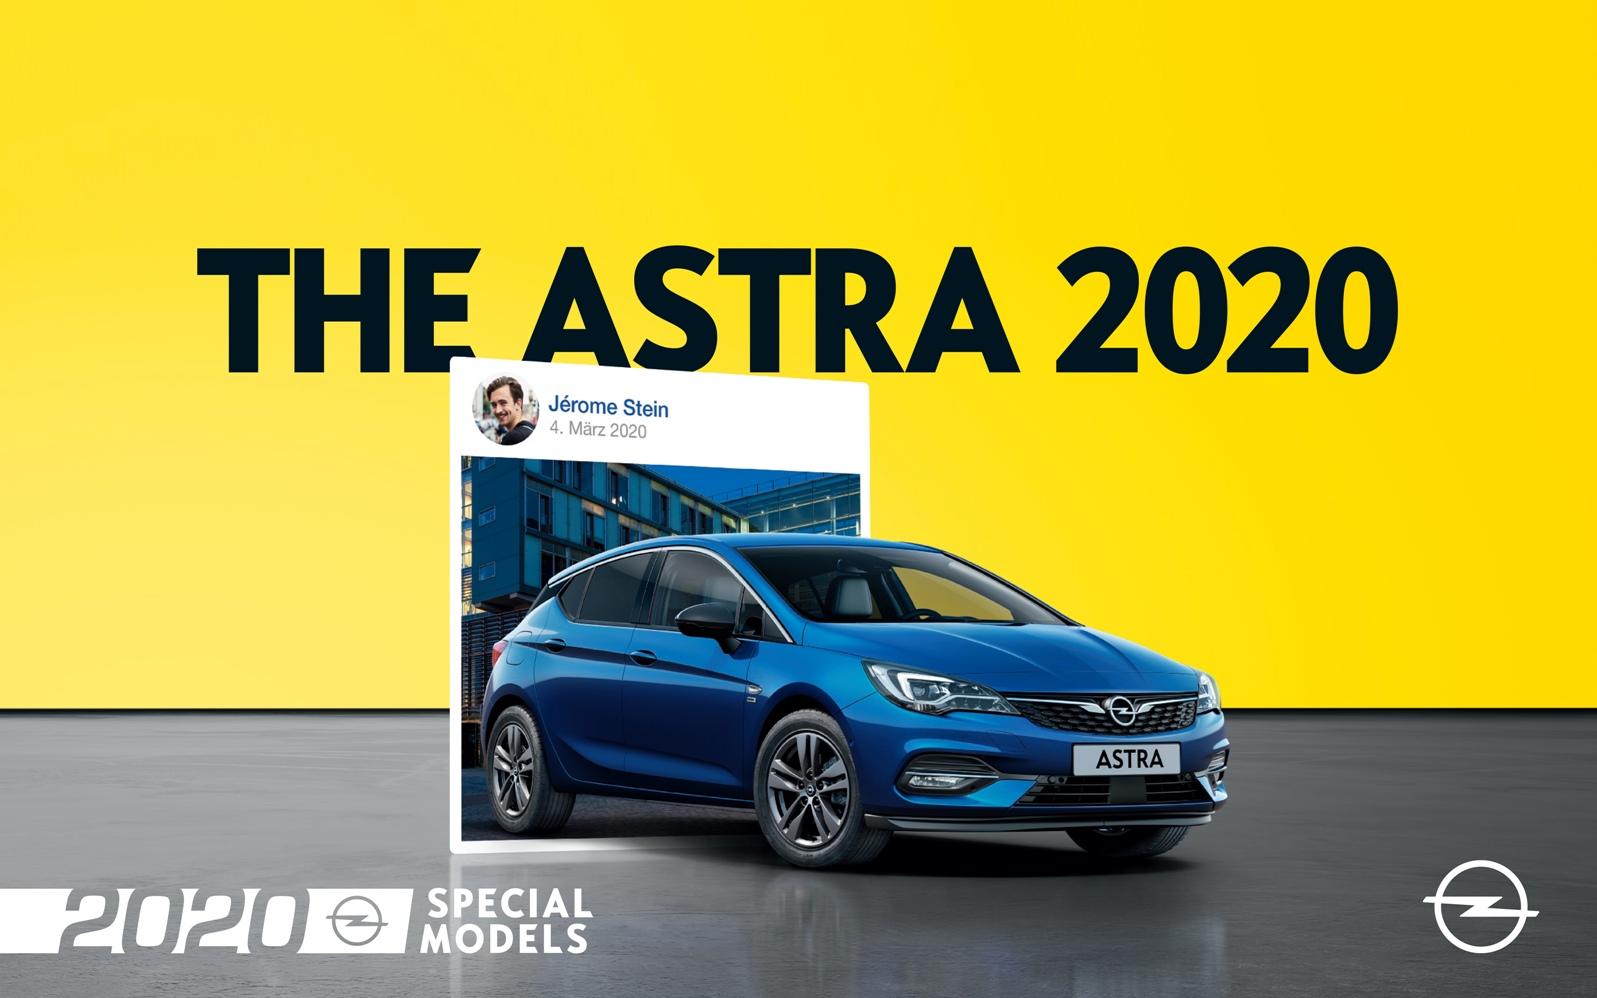 Opel Astra 2020 Special Models